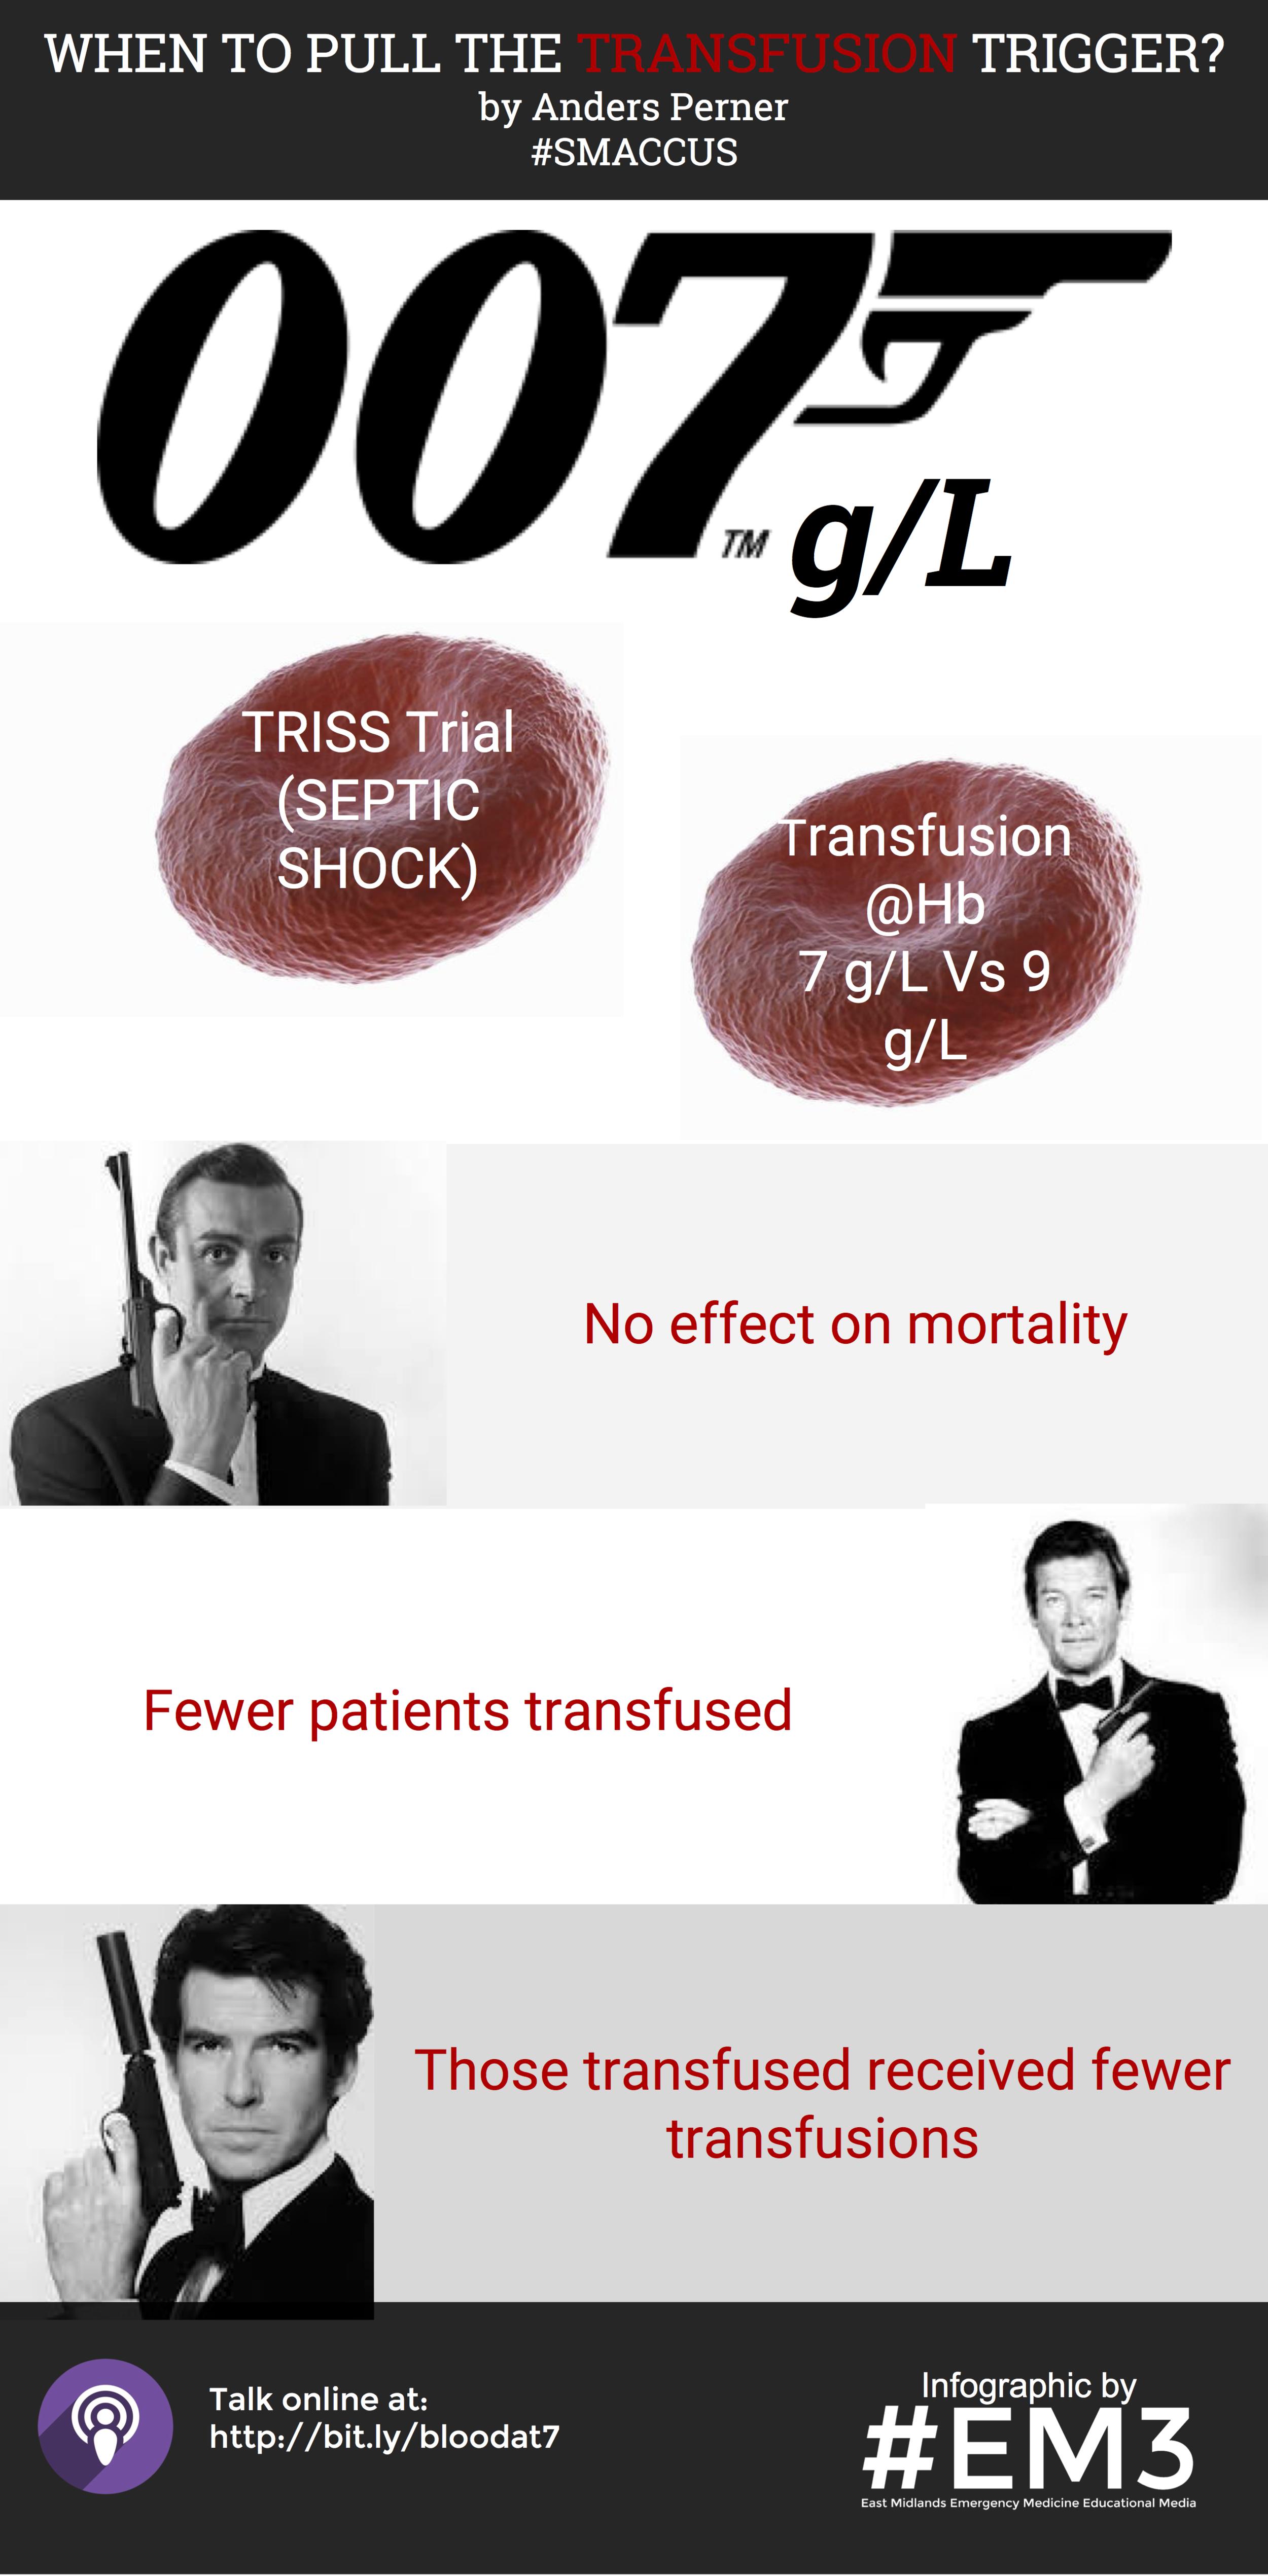 Transfusion Trigger 007